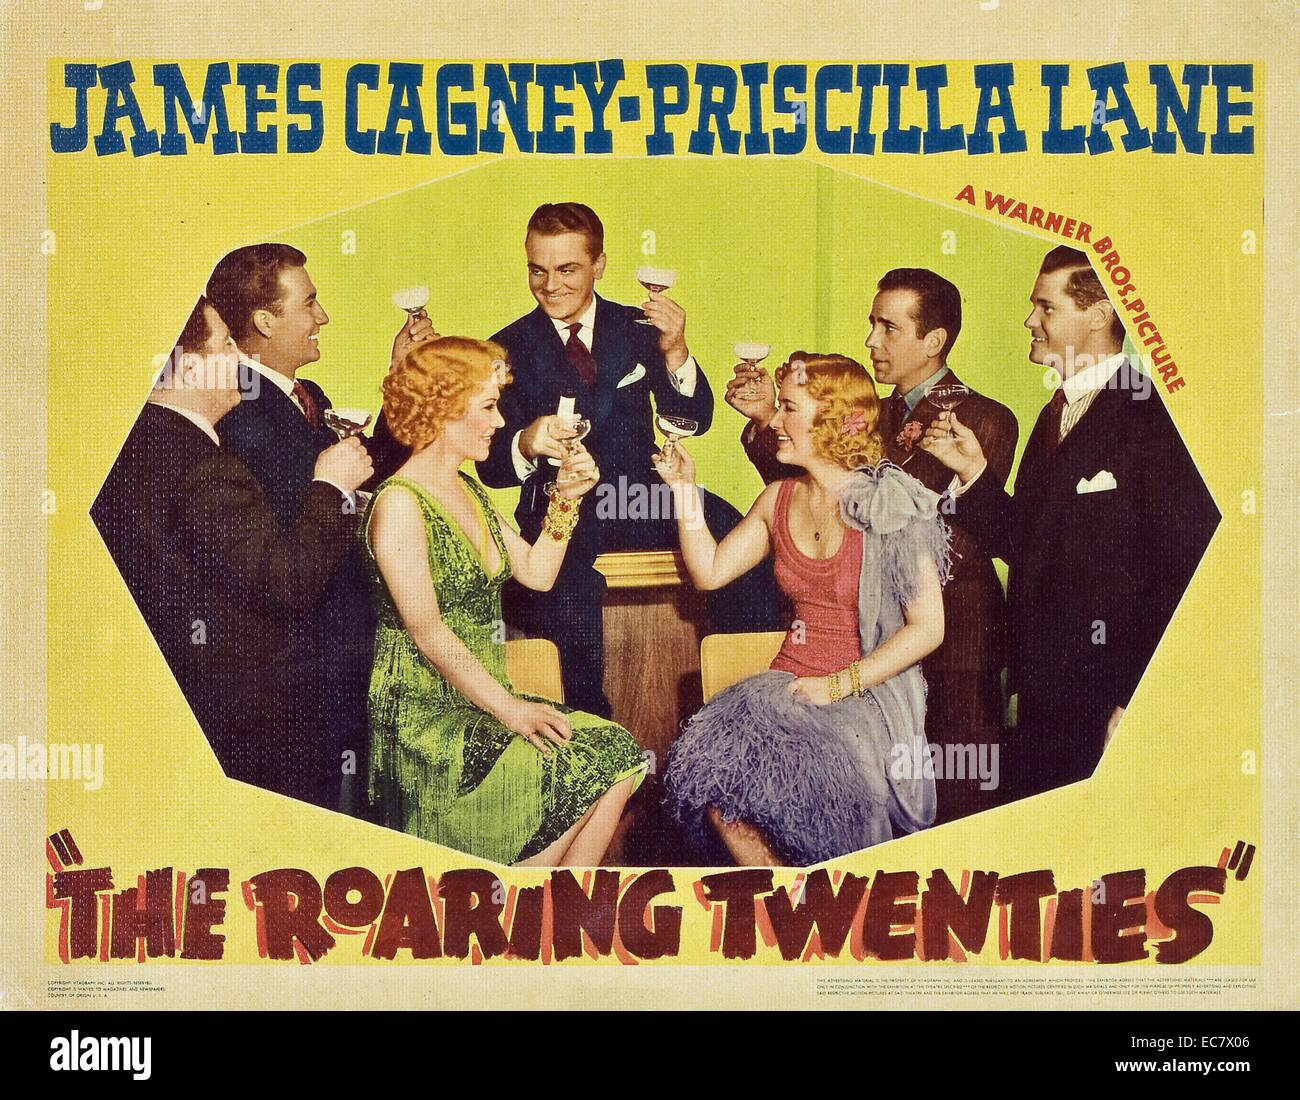 The Roaring Twenties, a 1939 crime thriller starring James Cagney, Priscilla Lane, Humphrey Bogart - Stock Image